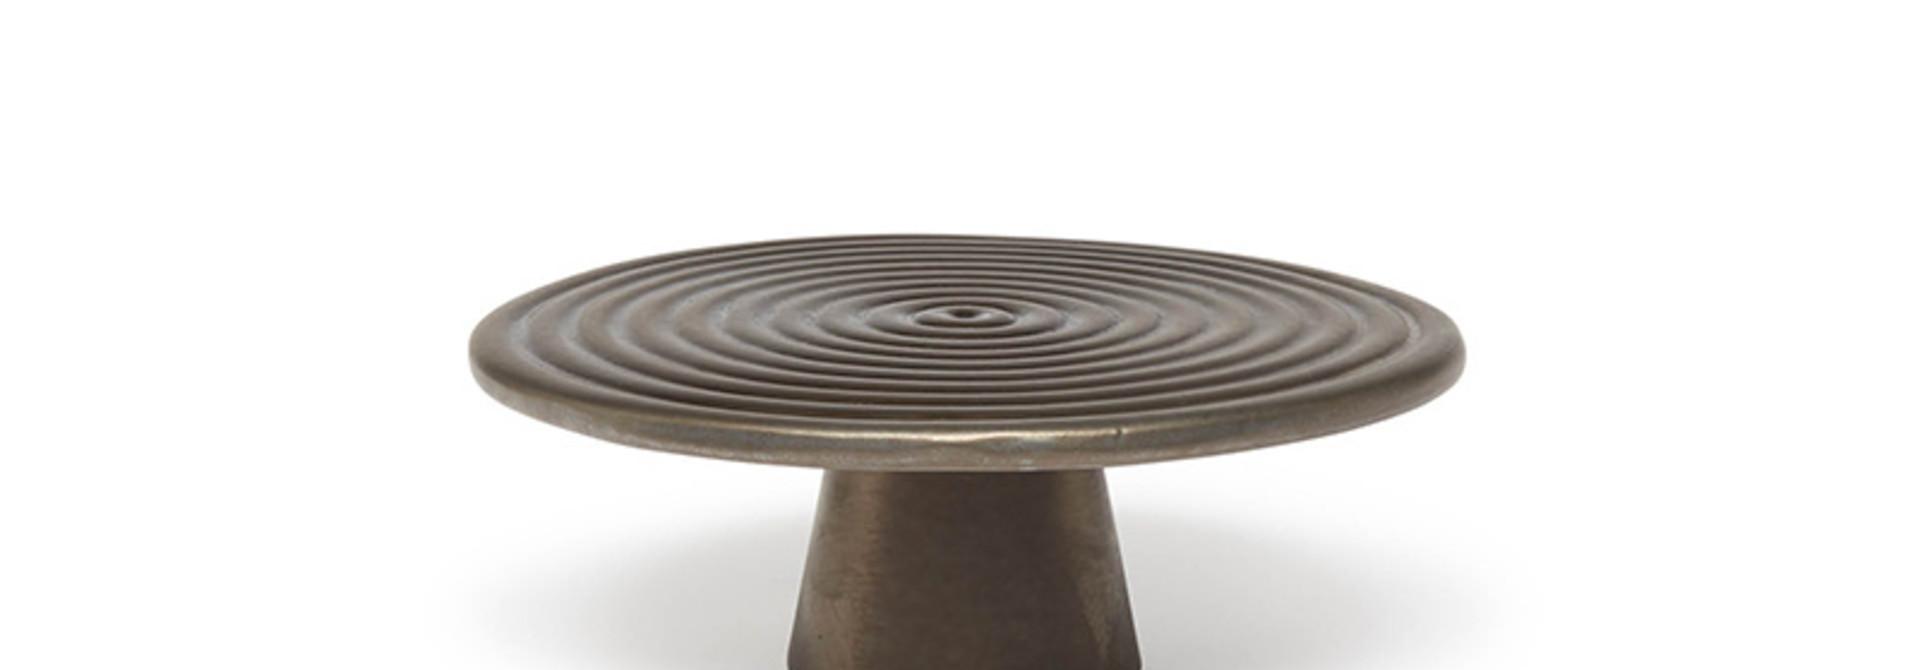 Food/Cake Stand - Platinum Matt - Sm